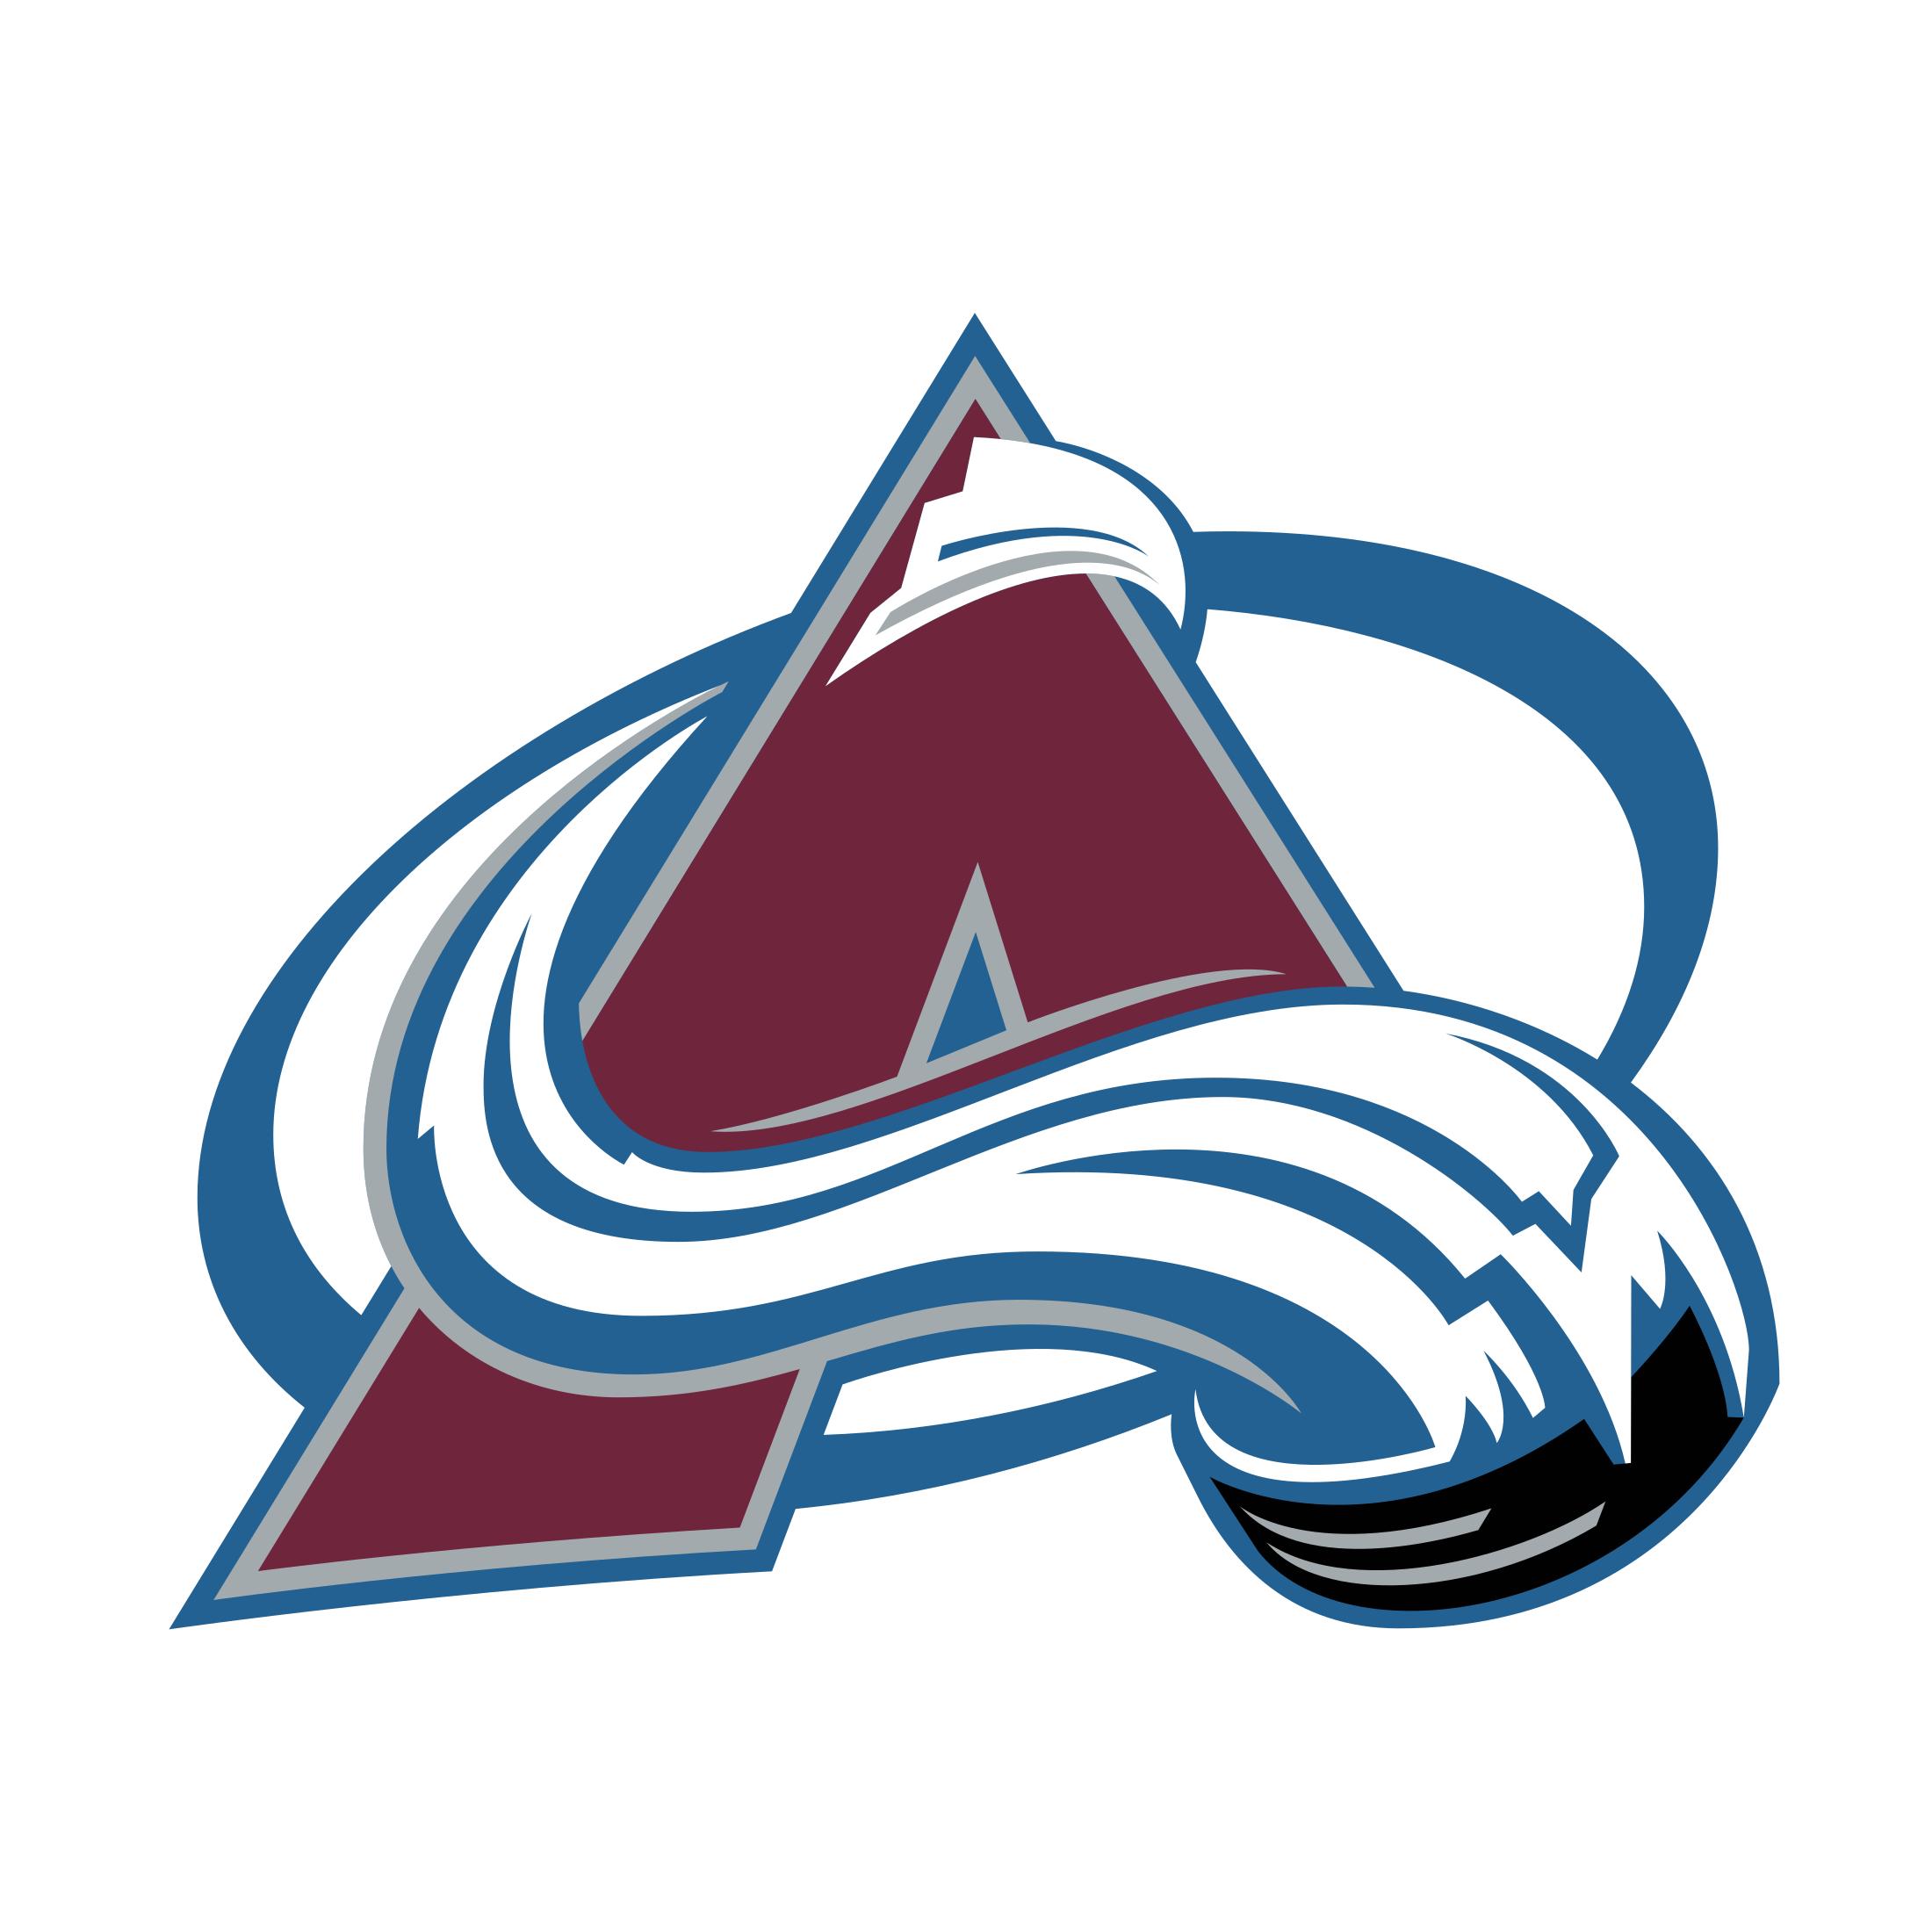 Colorado Avalanche Logo PNG Transparent & SVG Vector.